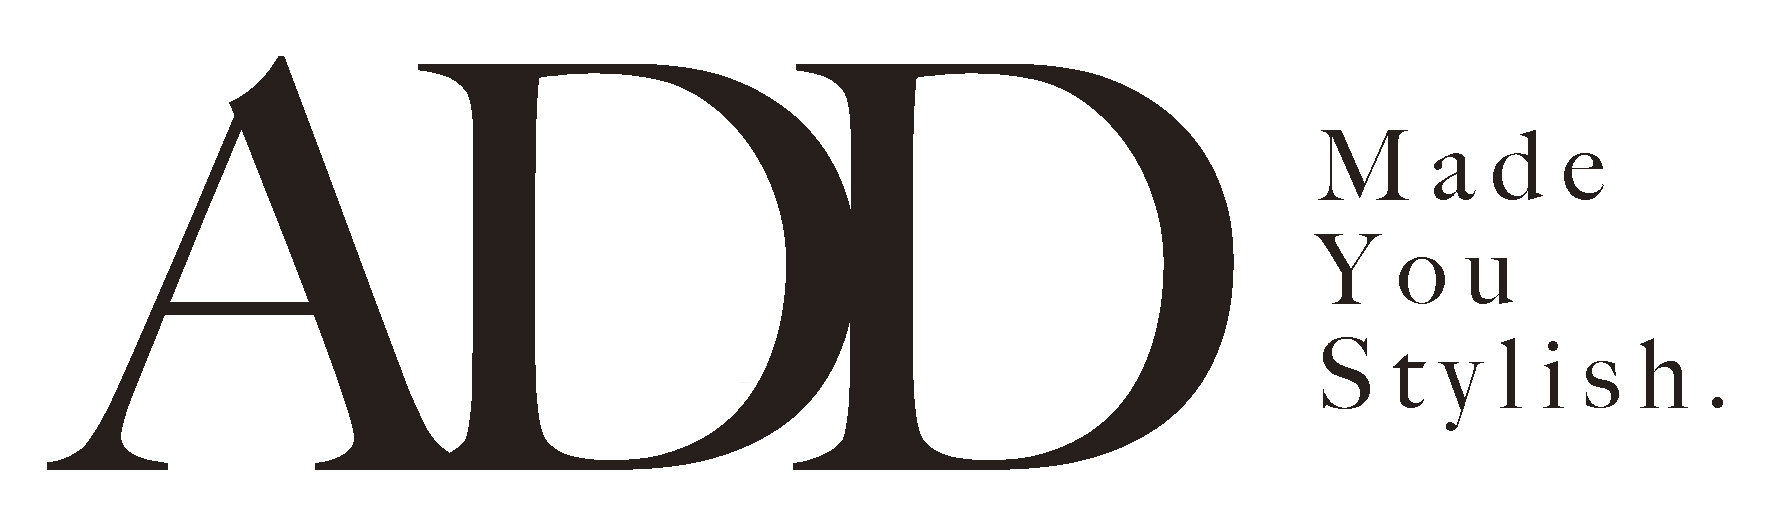 【<ADD Web magazine>インタビュー → 本日再入荷予定のアイテム紹介】